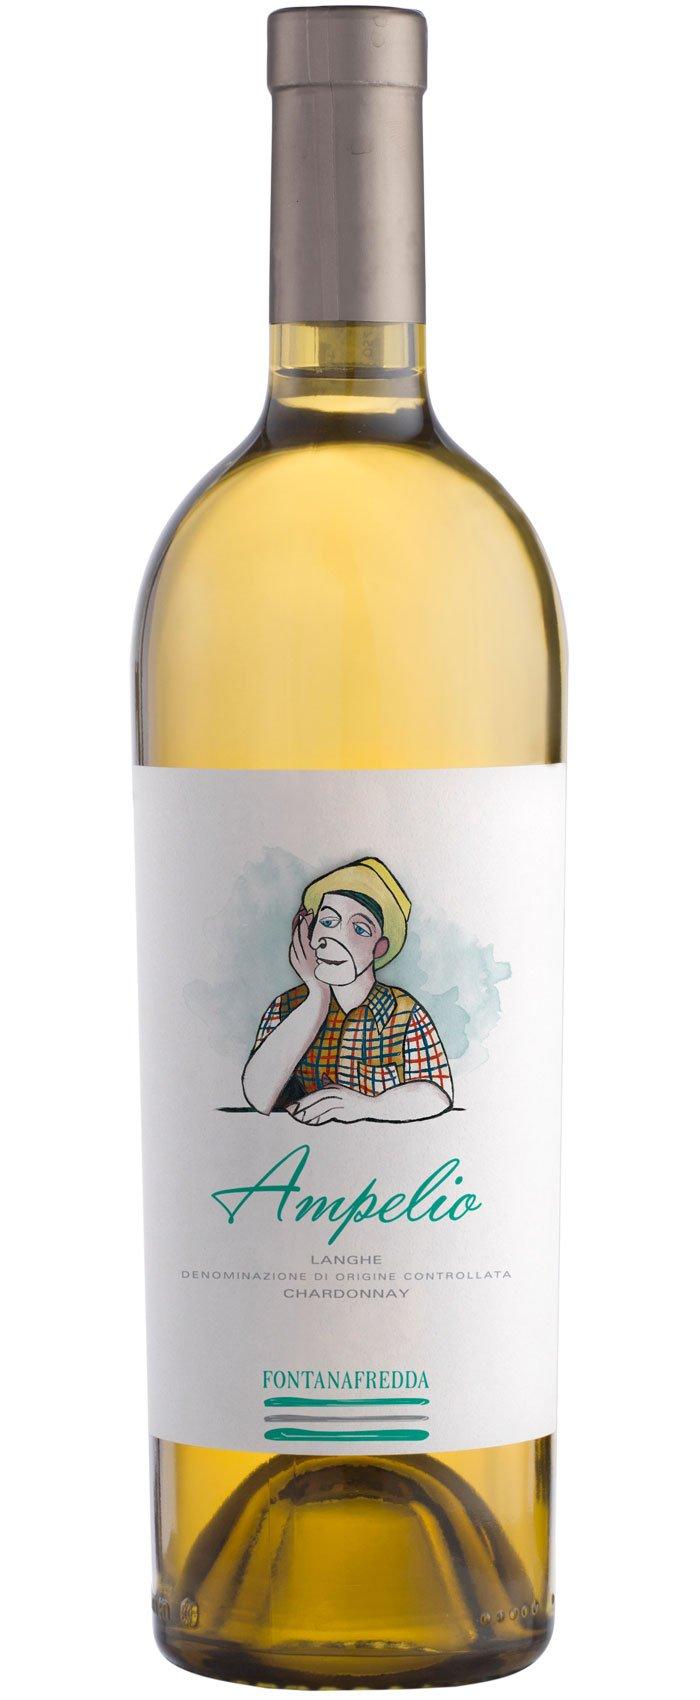 Fontanafredda-Ampelio-Langhe-Chardonnay-DOC-2016-Trocken-3-x-075-l